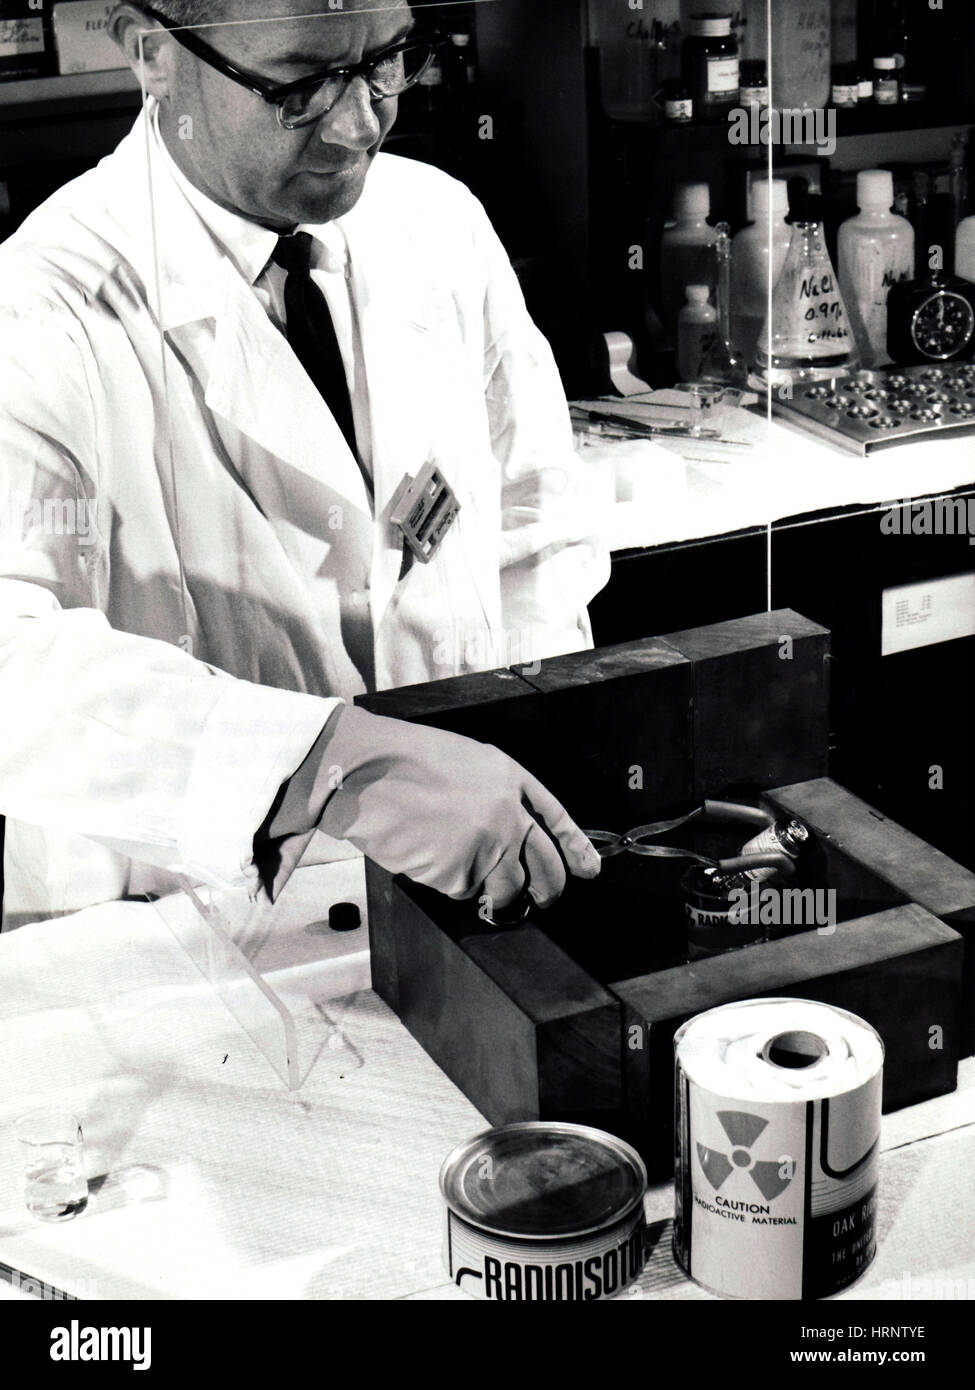 FDA Dosimeter checks Radiation Exposure - Stock Image